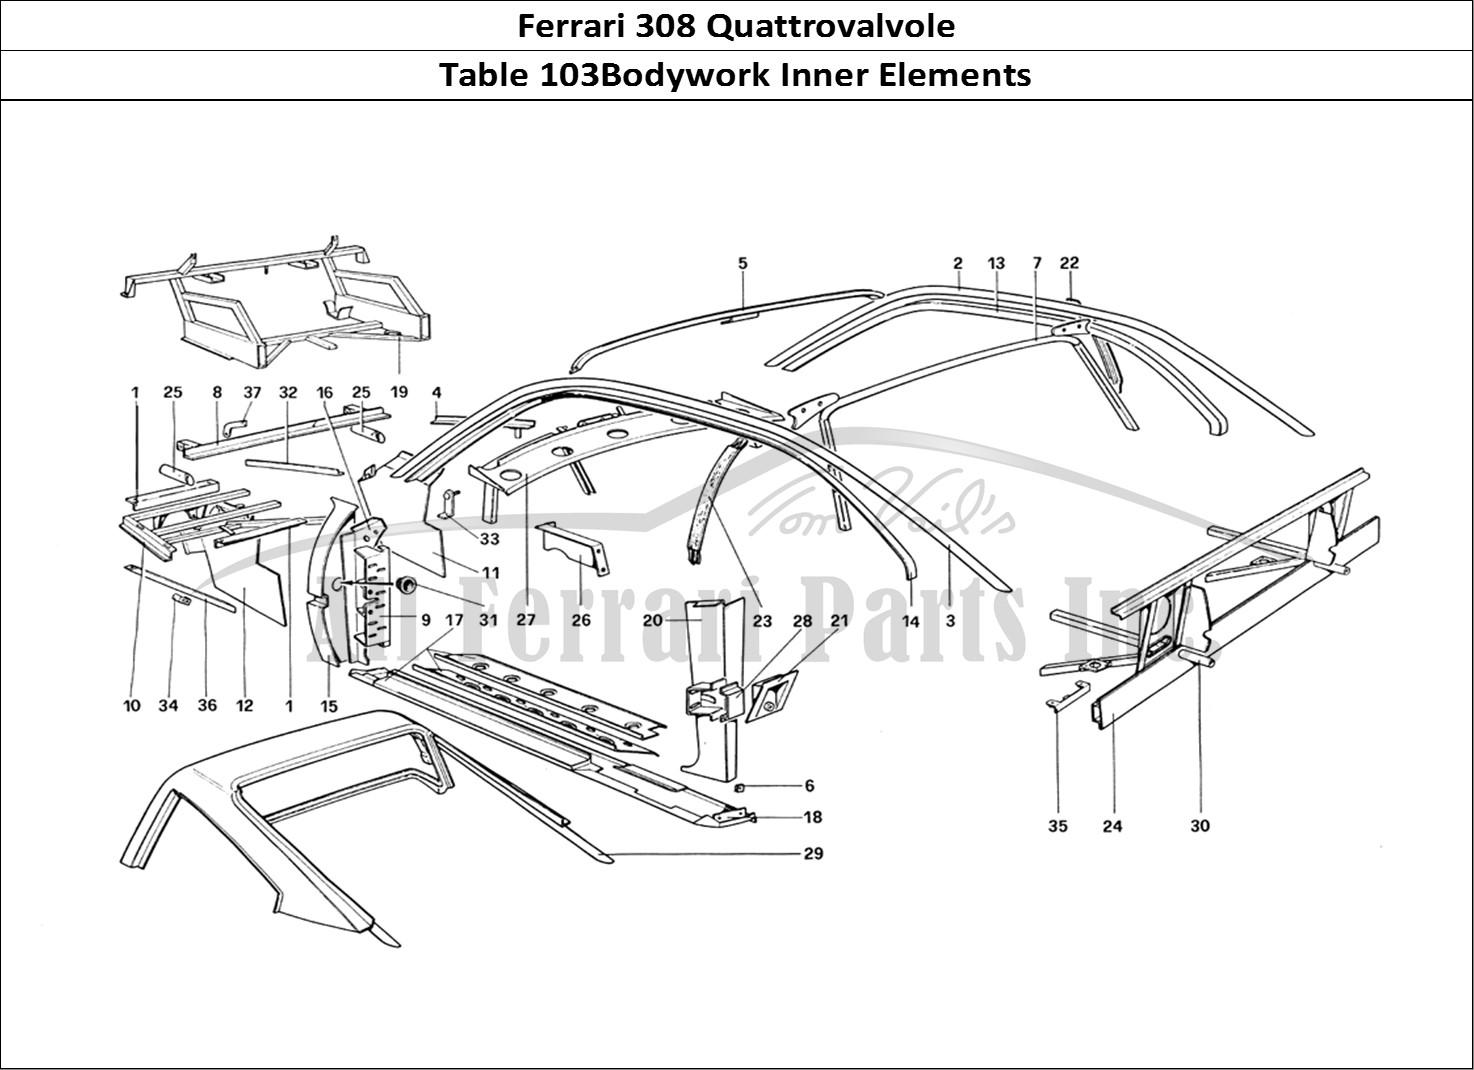 Buy original Ferrari 308 Quattrovalvole 103Bodywork Inner